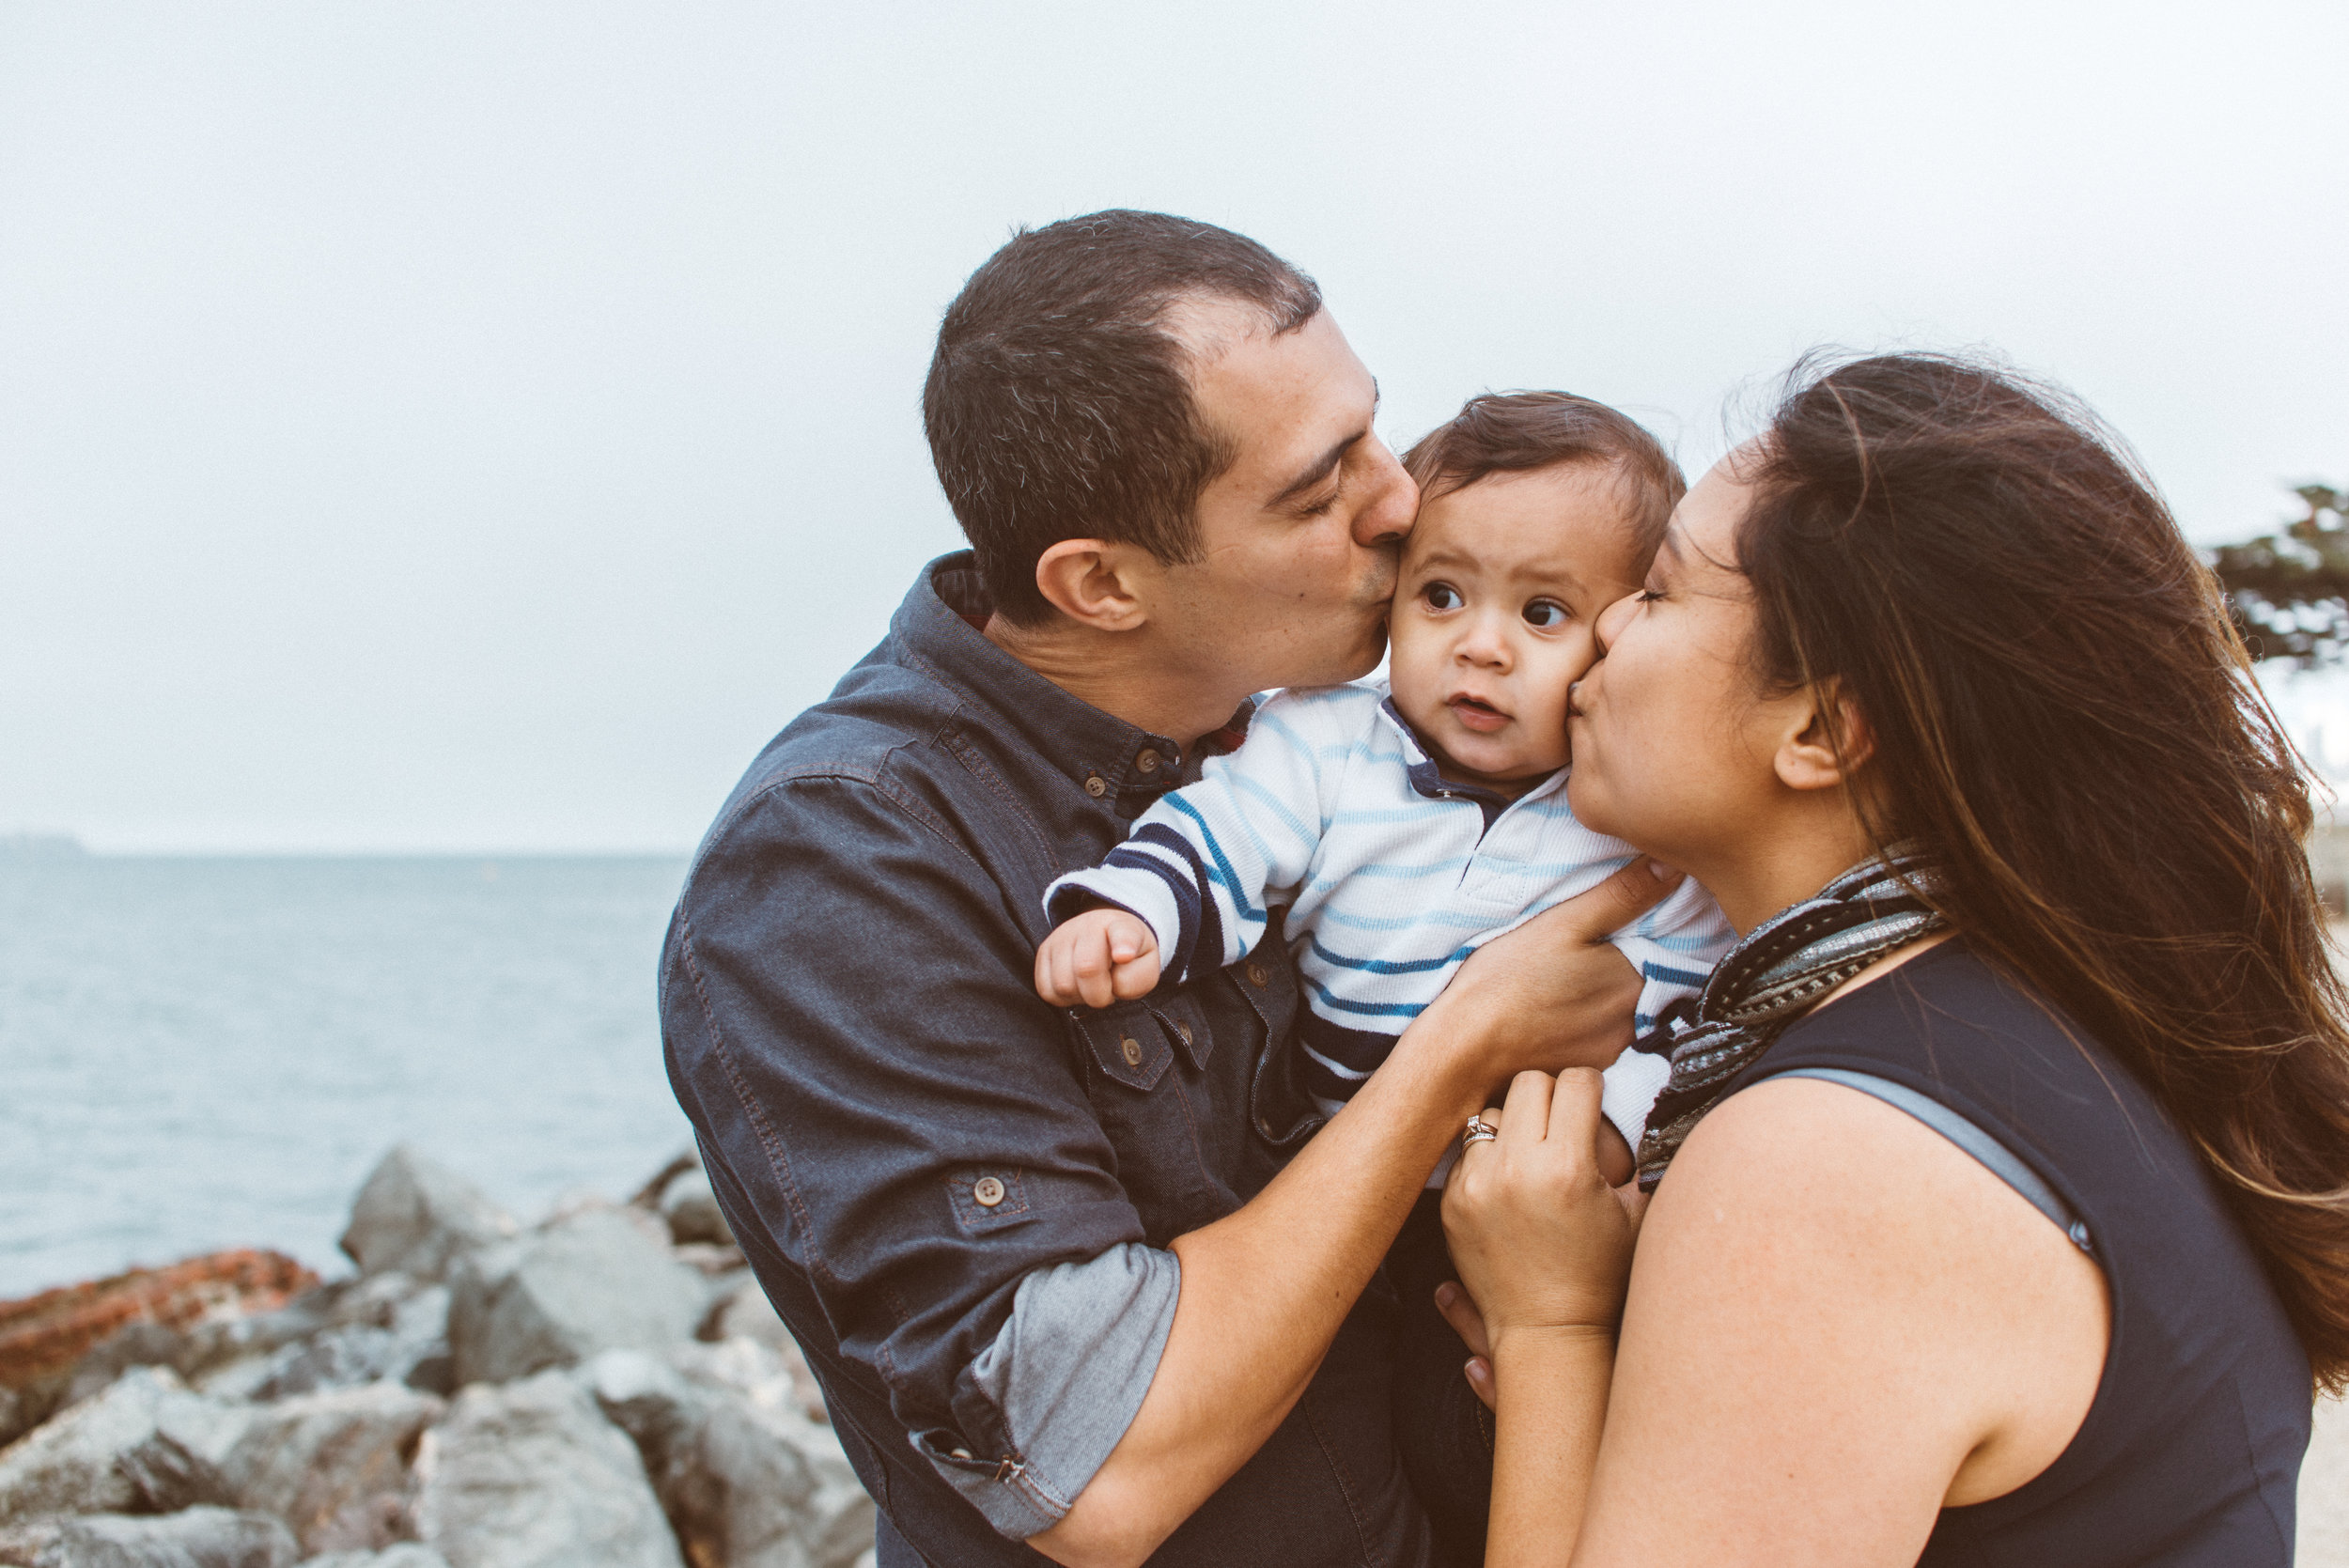 LUMA Photography - San Francisco Family Photographer